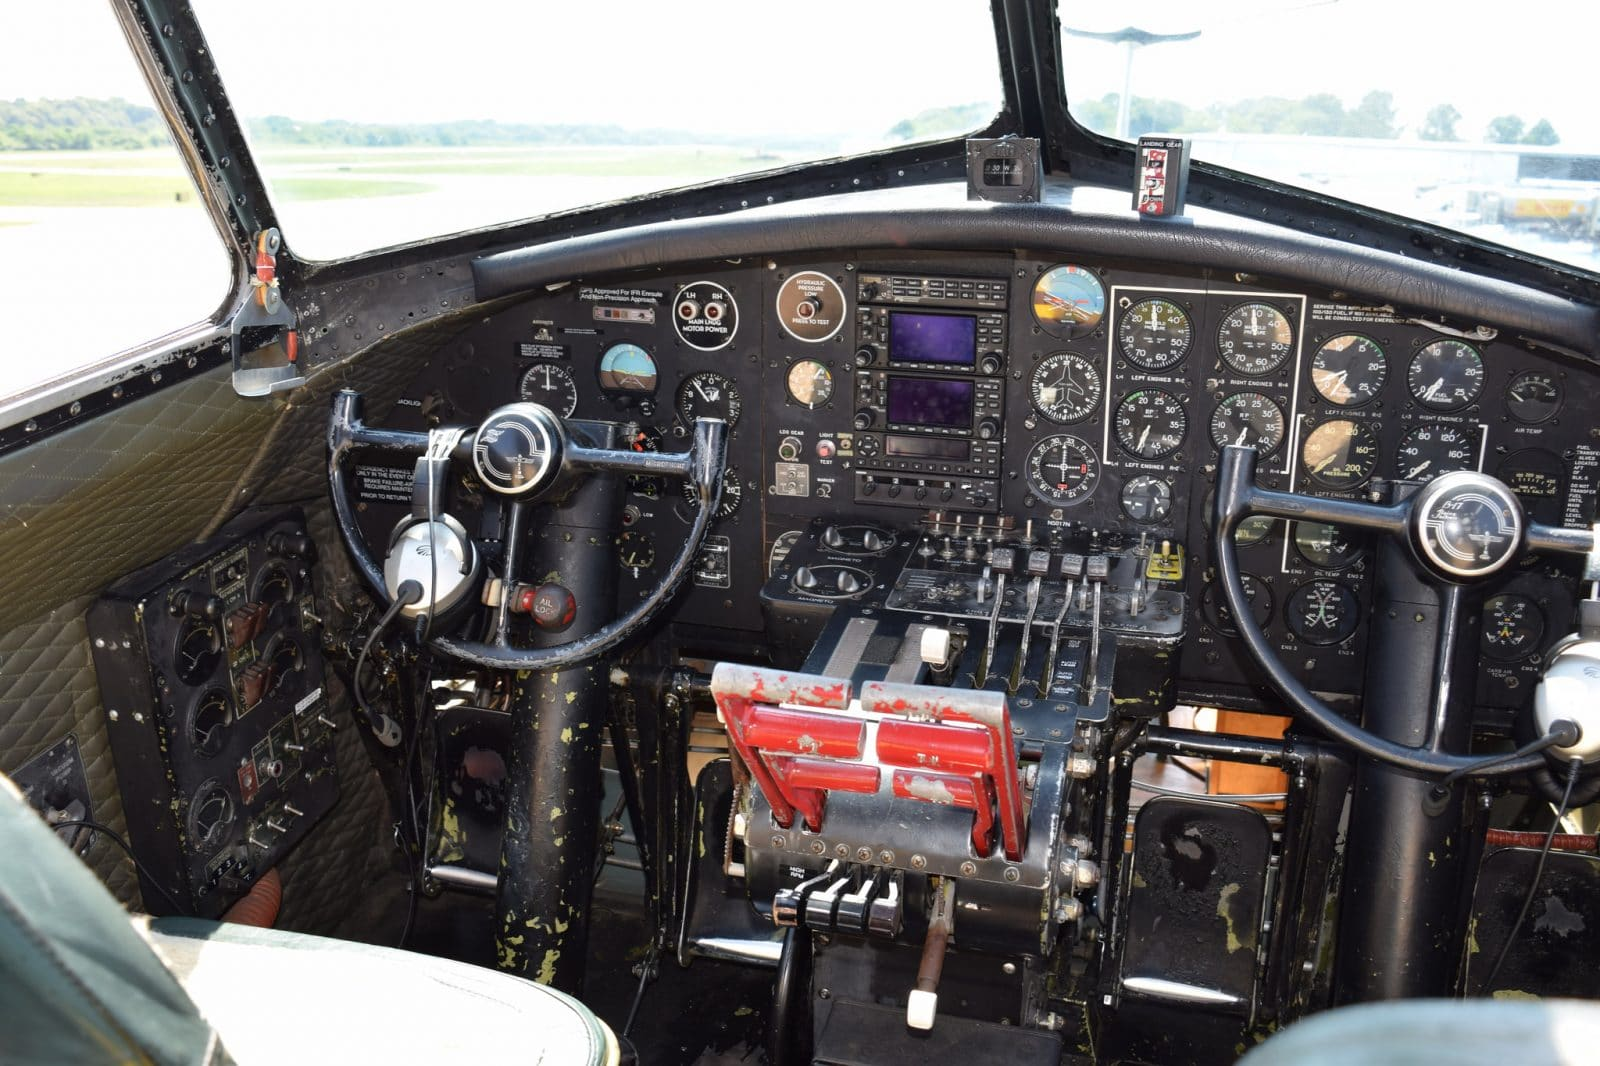 Historic B-17 Flying Fortress 'Aluminum Overcast' touring